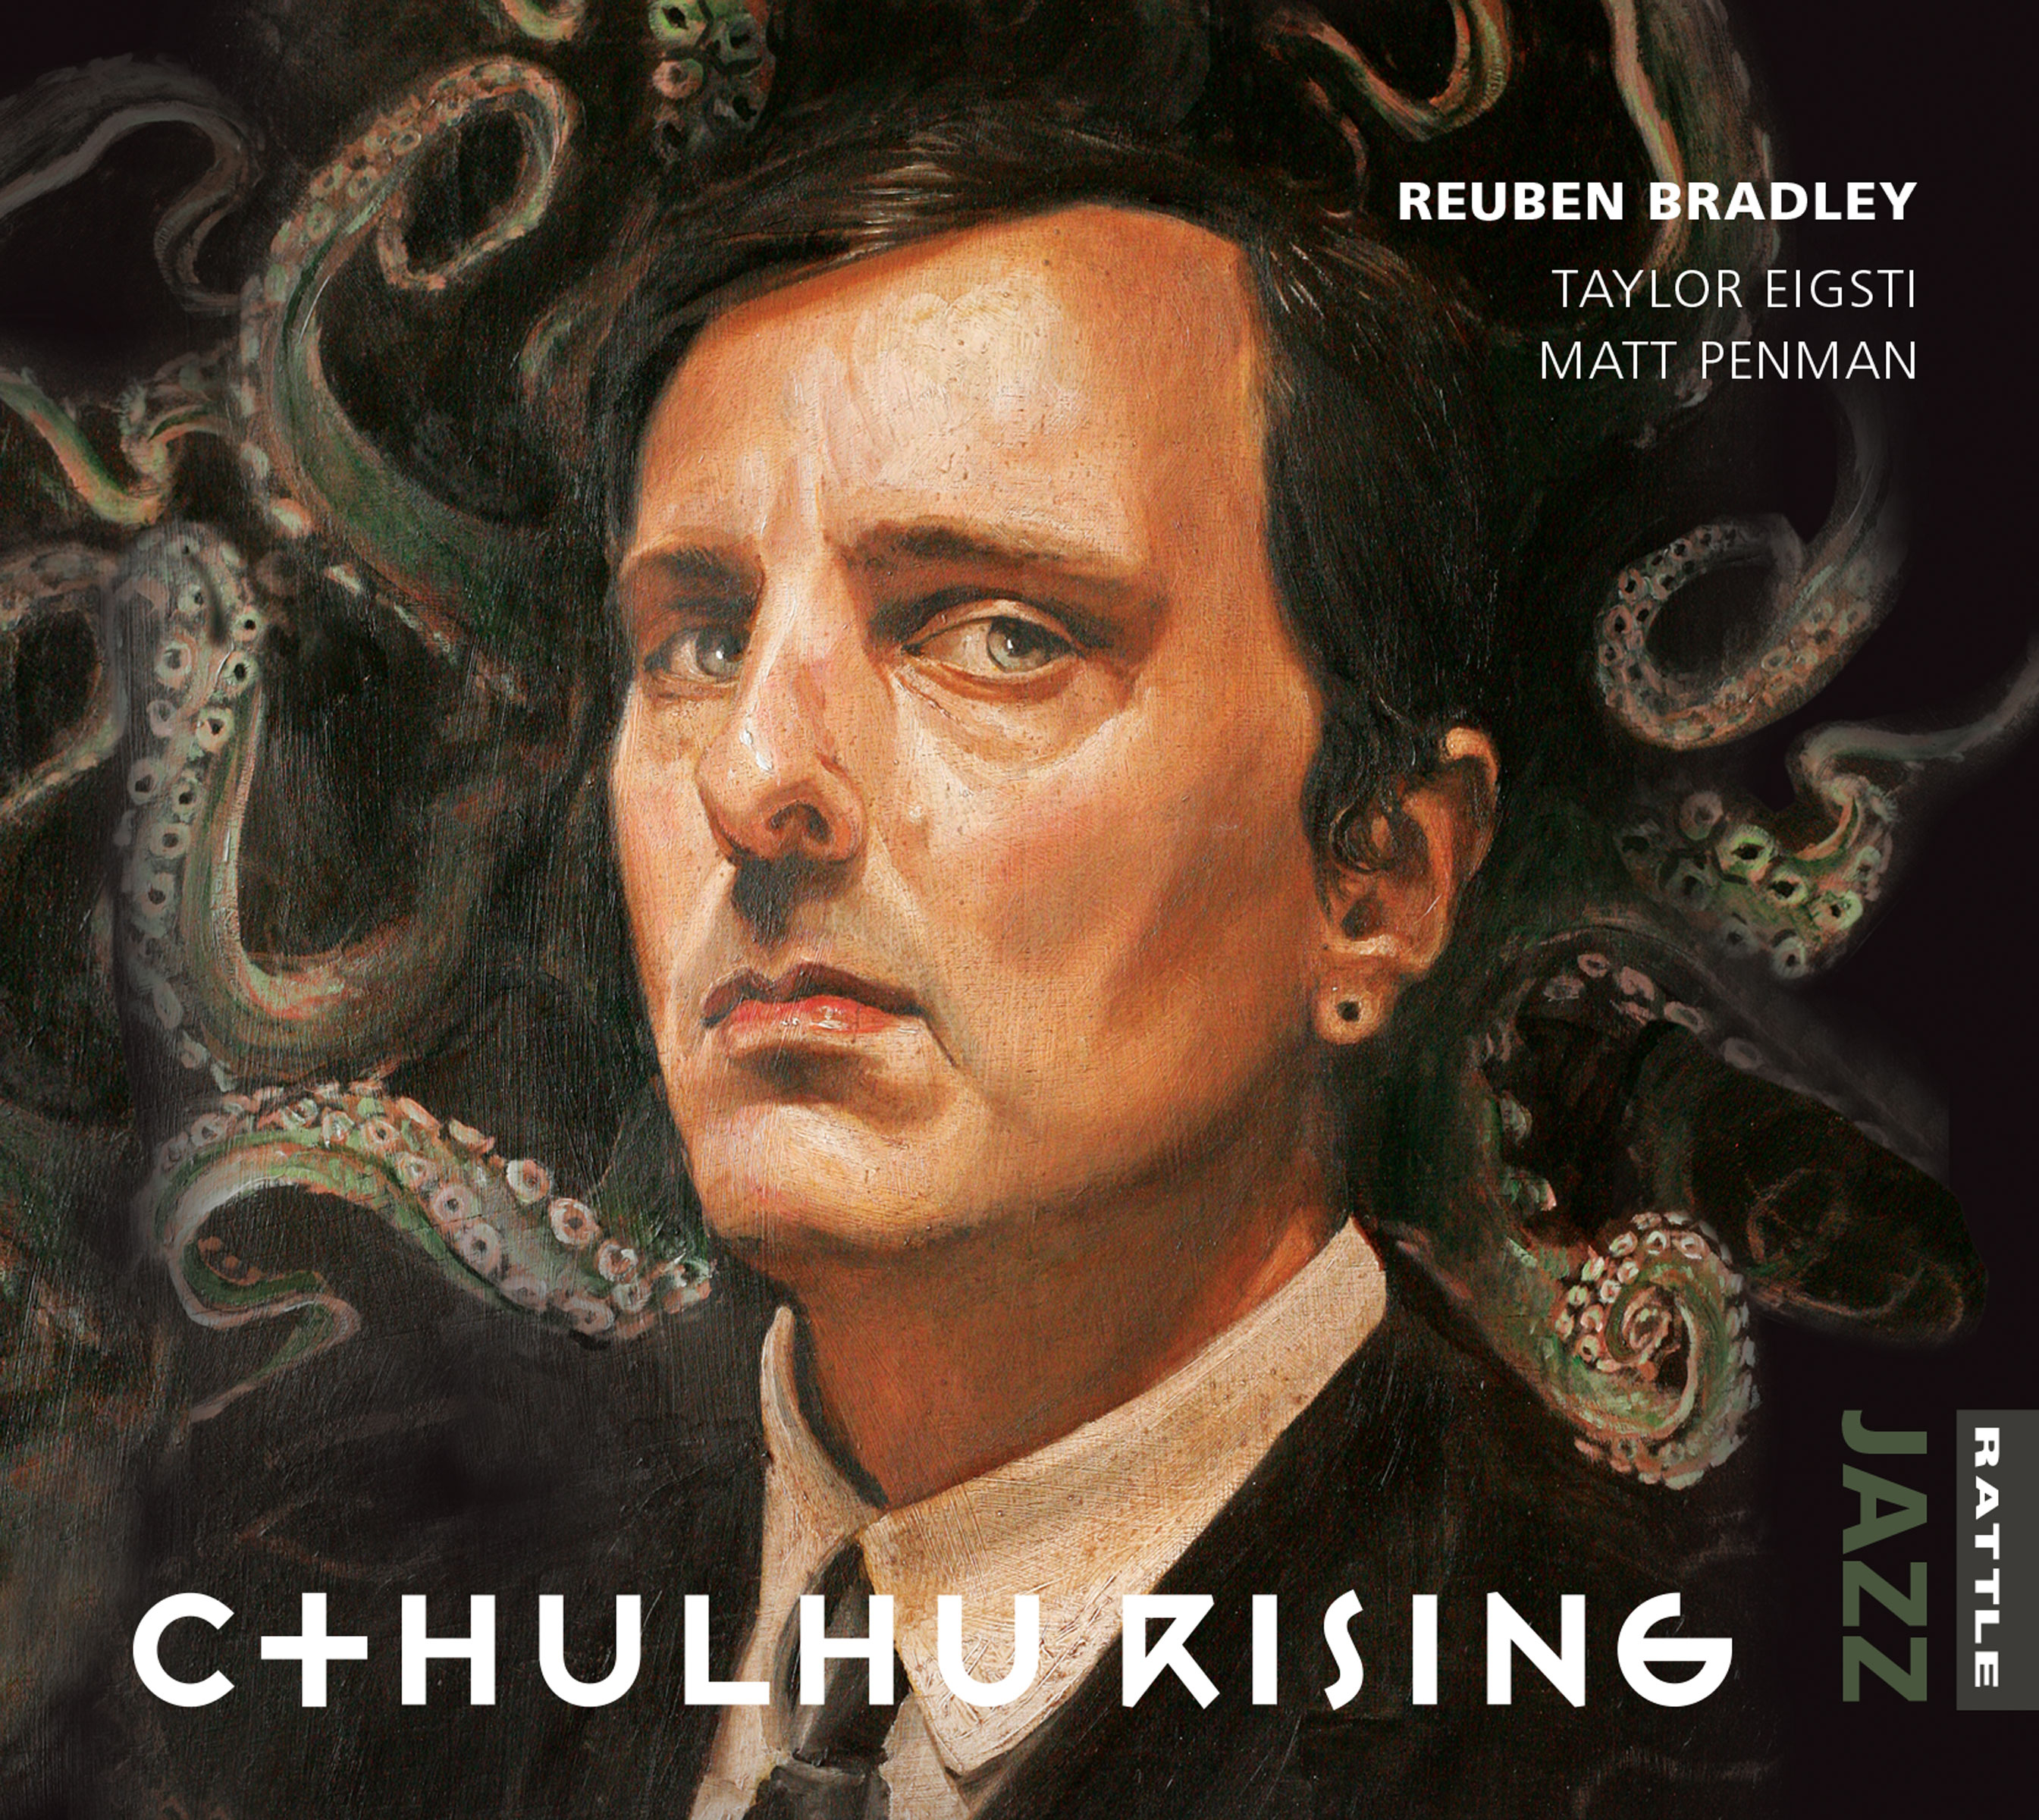 Reuben Bradley | Cthulhu Rising - downloadable MP3 ALBUM